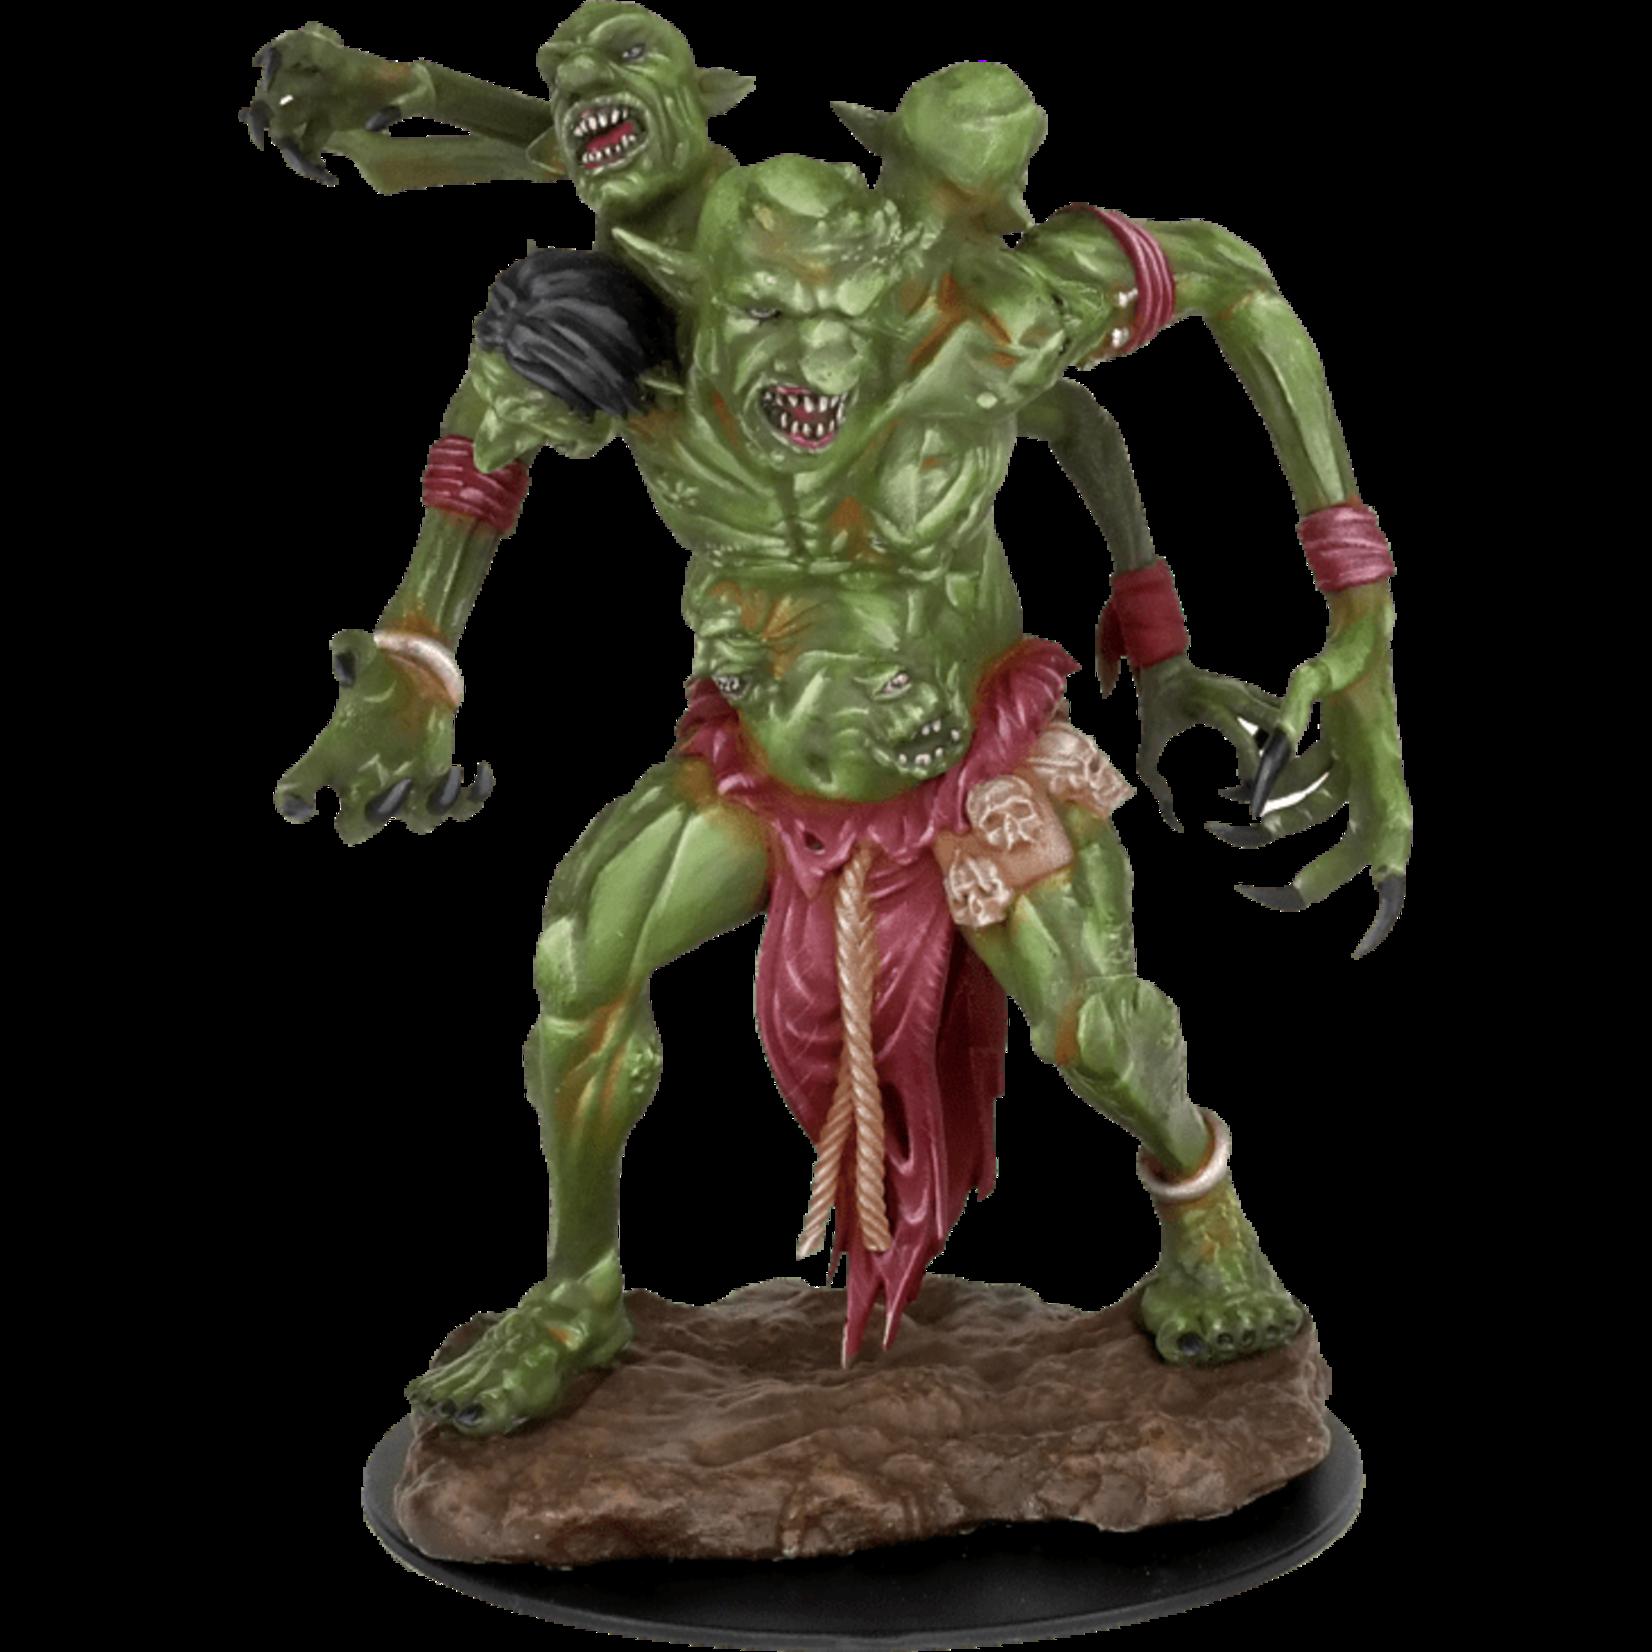 WizKids Dungeons & Dragons: Nolzur's Marvelous Miniatures: Dire Troll Paint Night Kit